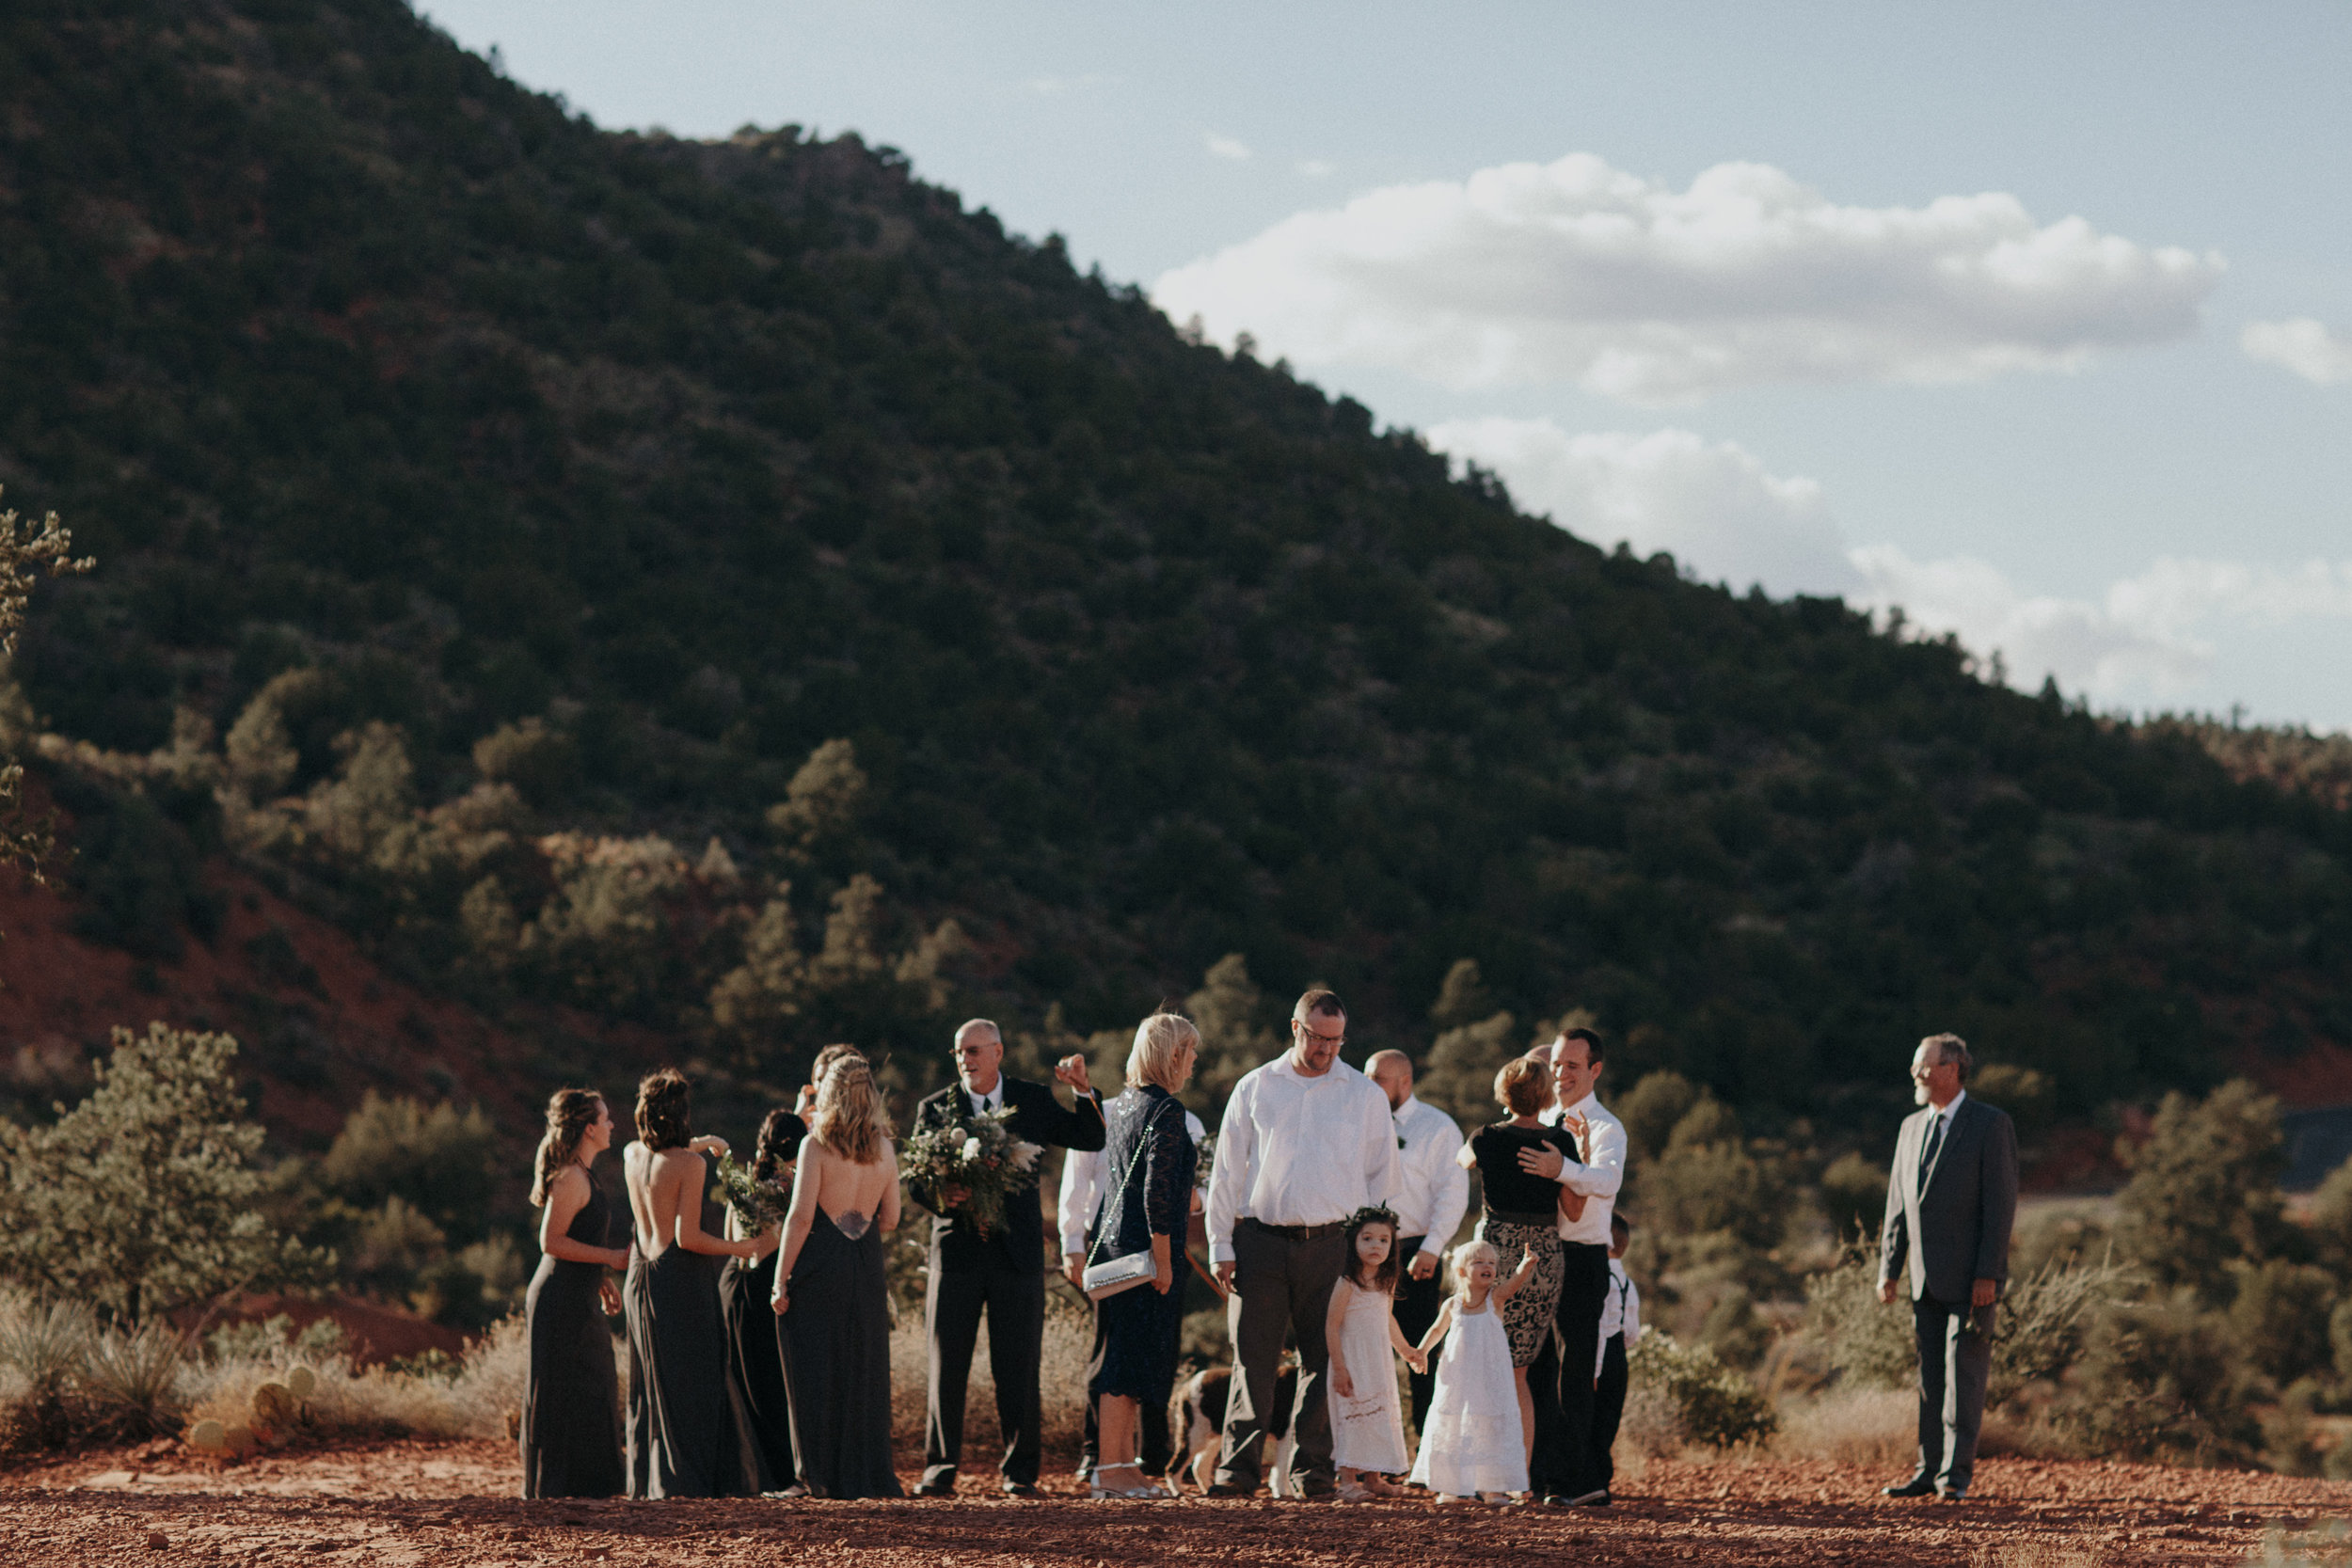 Sedona Wedding - Ceremony on the Red Rocks